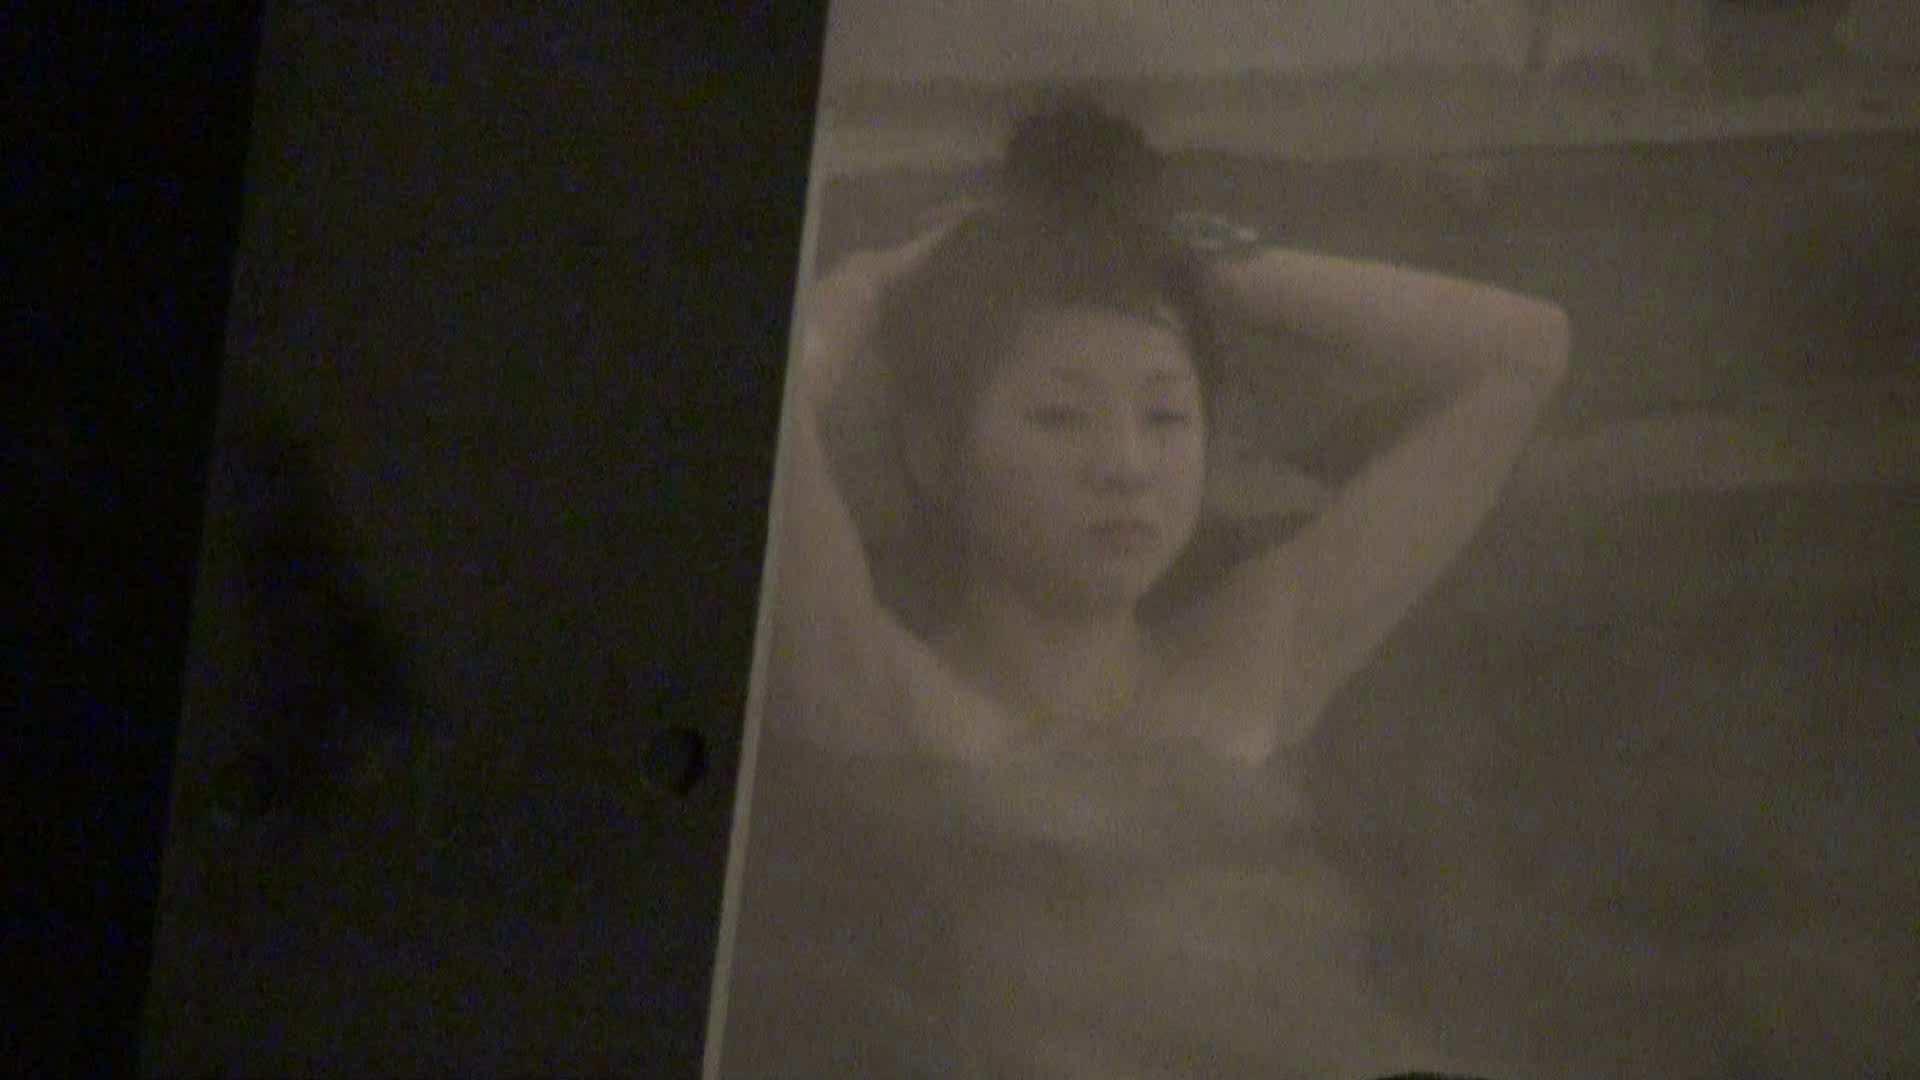 Aquaな露天風呂Vol.440 OLセックス 盗撮おまんこ無修正動画無料 63画像 38